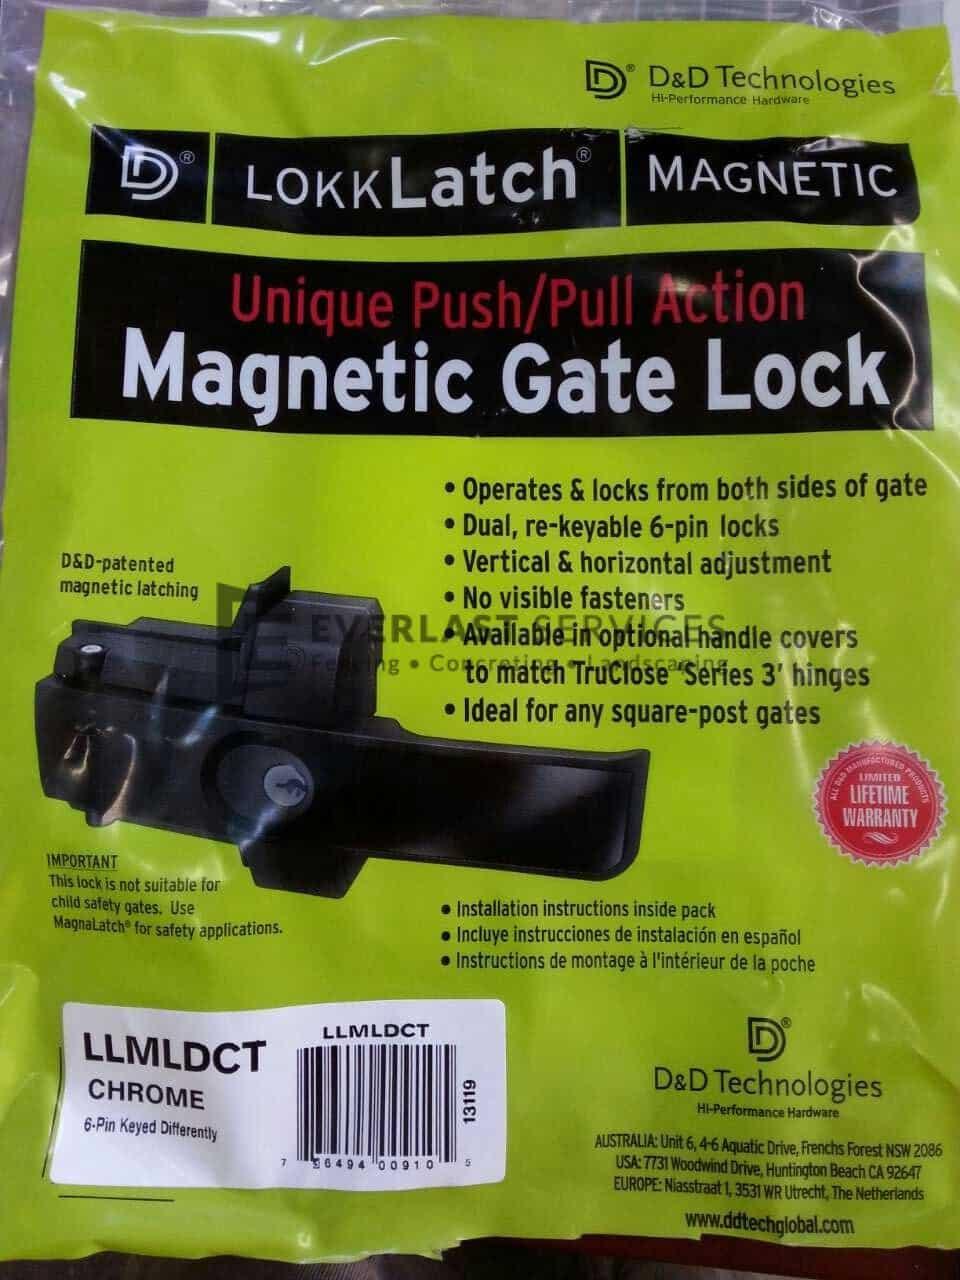 FS69 - D&D Technology Double Gate Lock